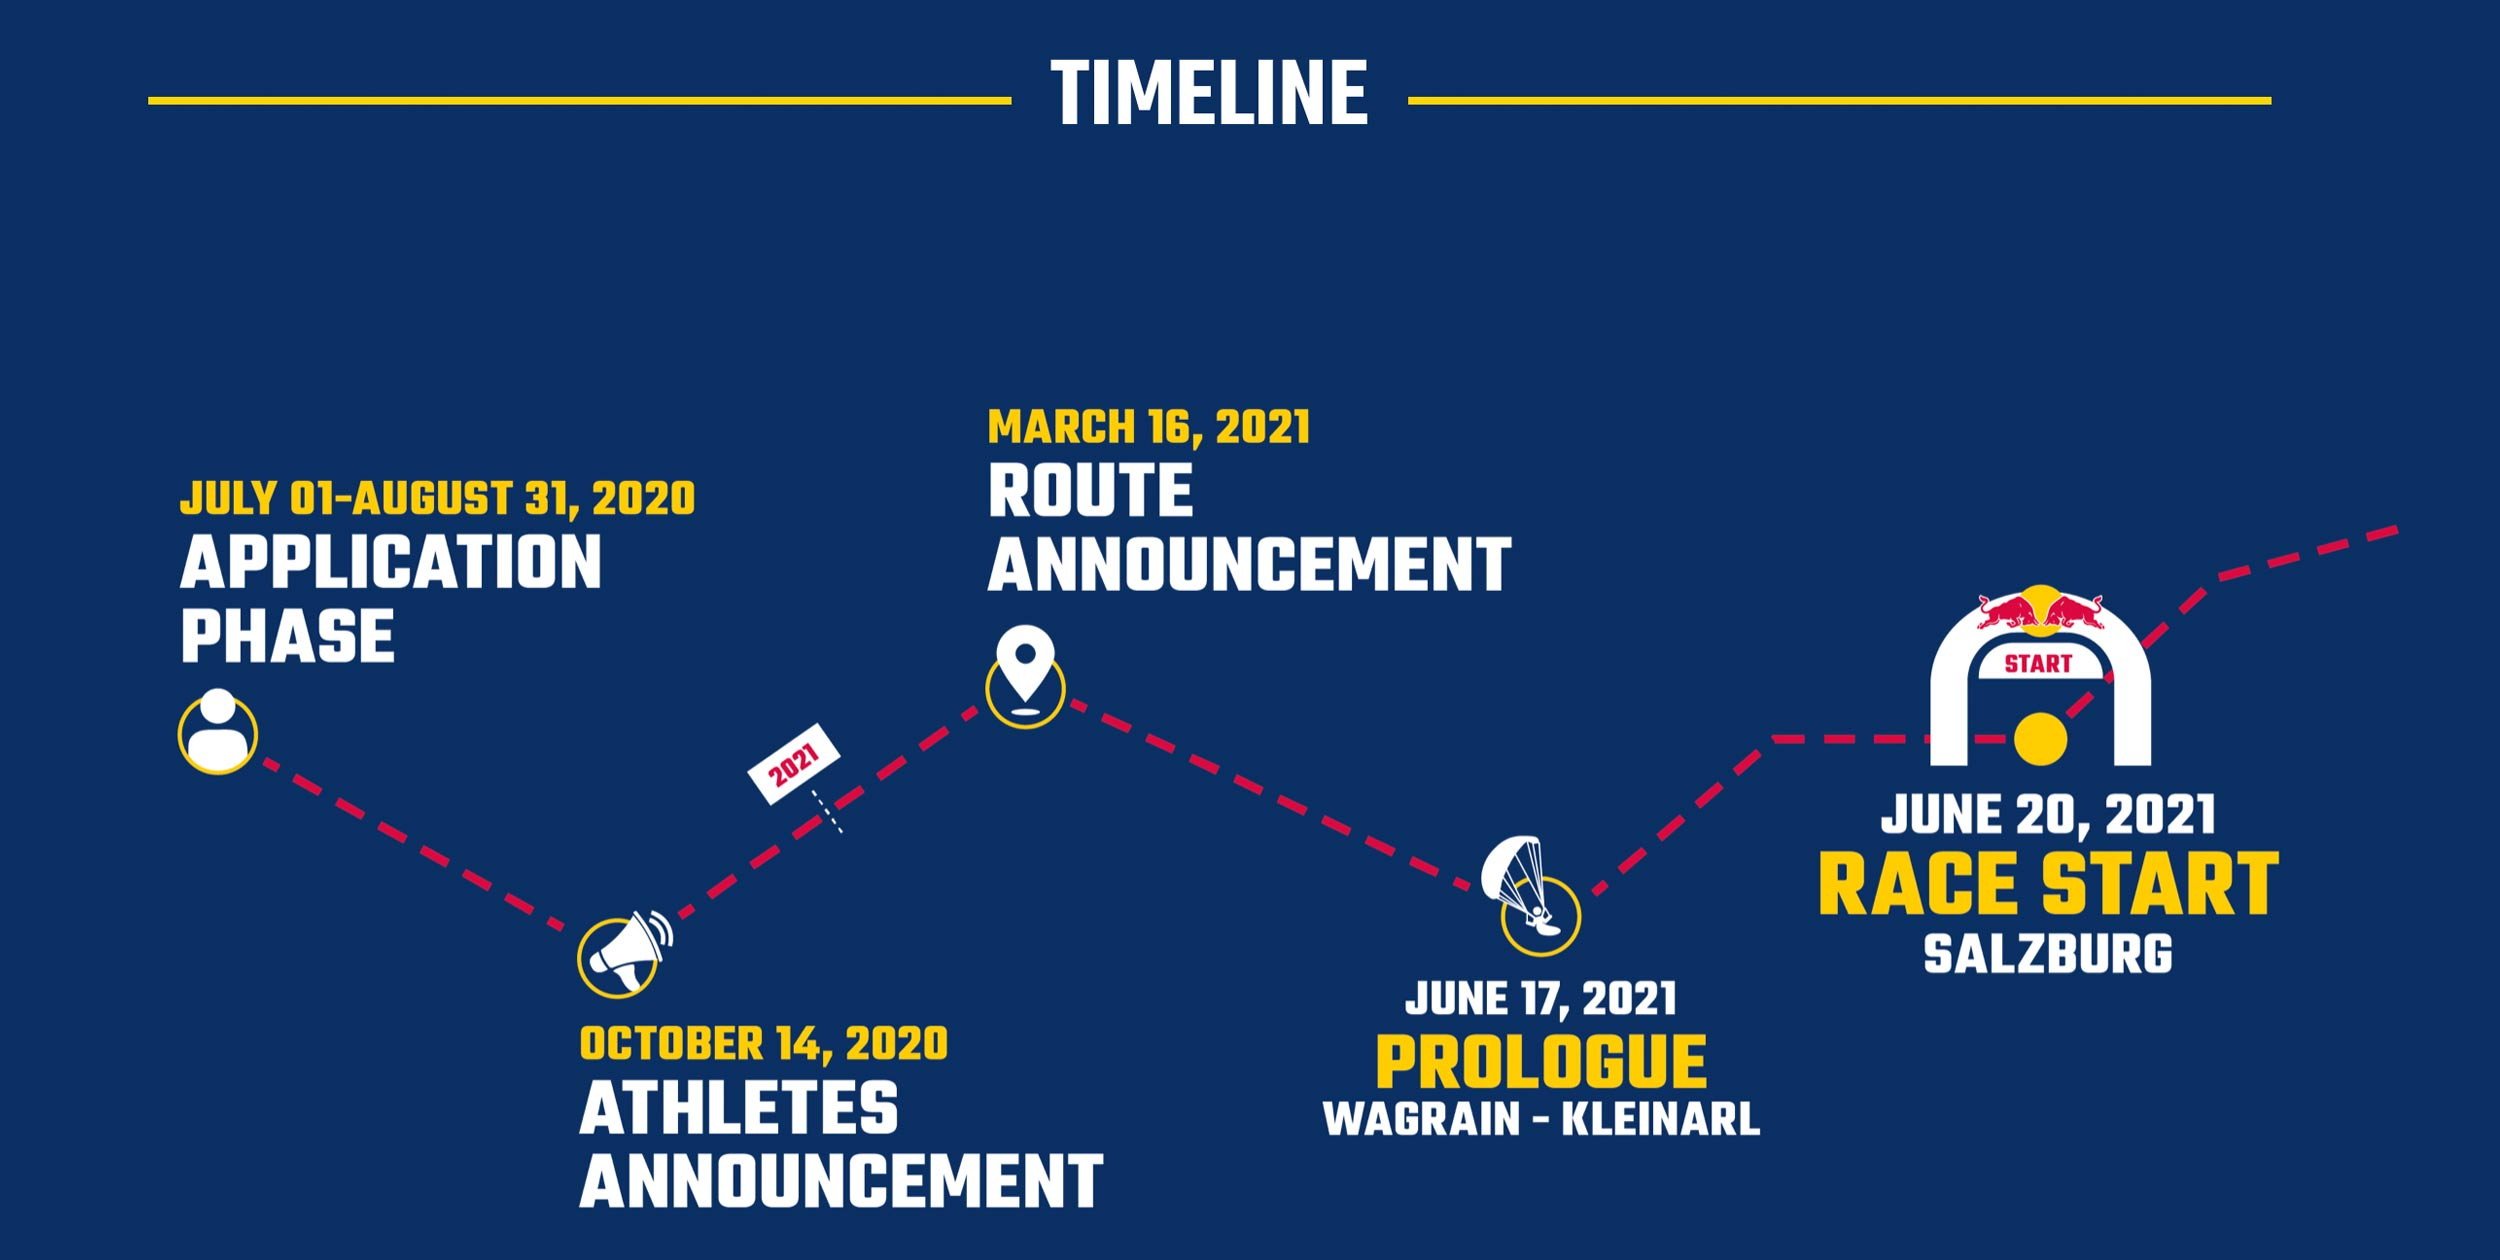 Red Bull X-Alps 2021 timeline